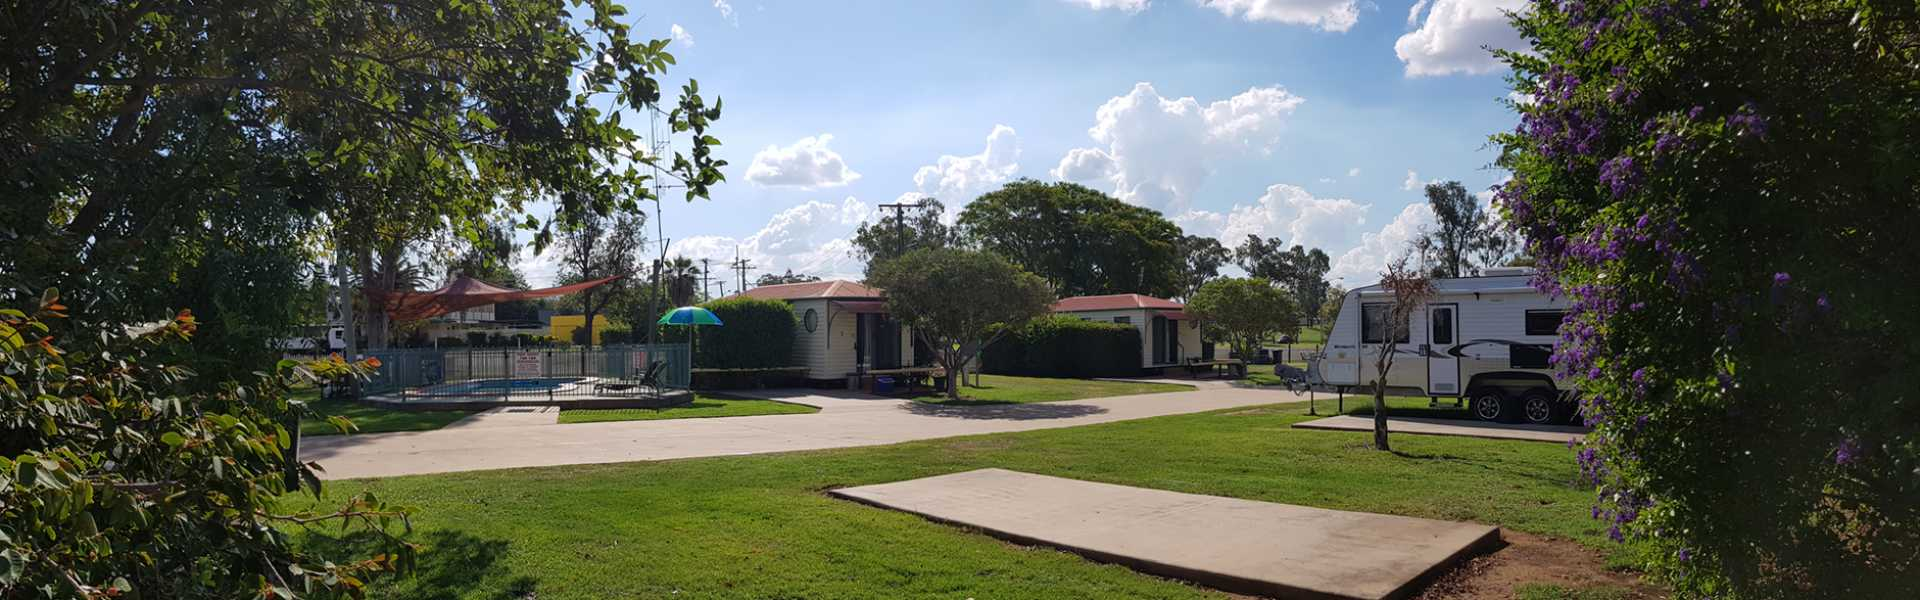 Kui Parks, Mundubbera, Three Rivers Tourist Park, Powered Sites